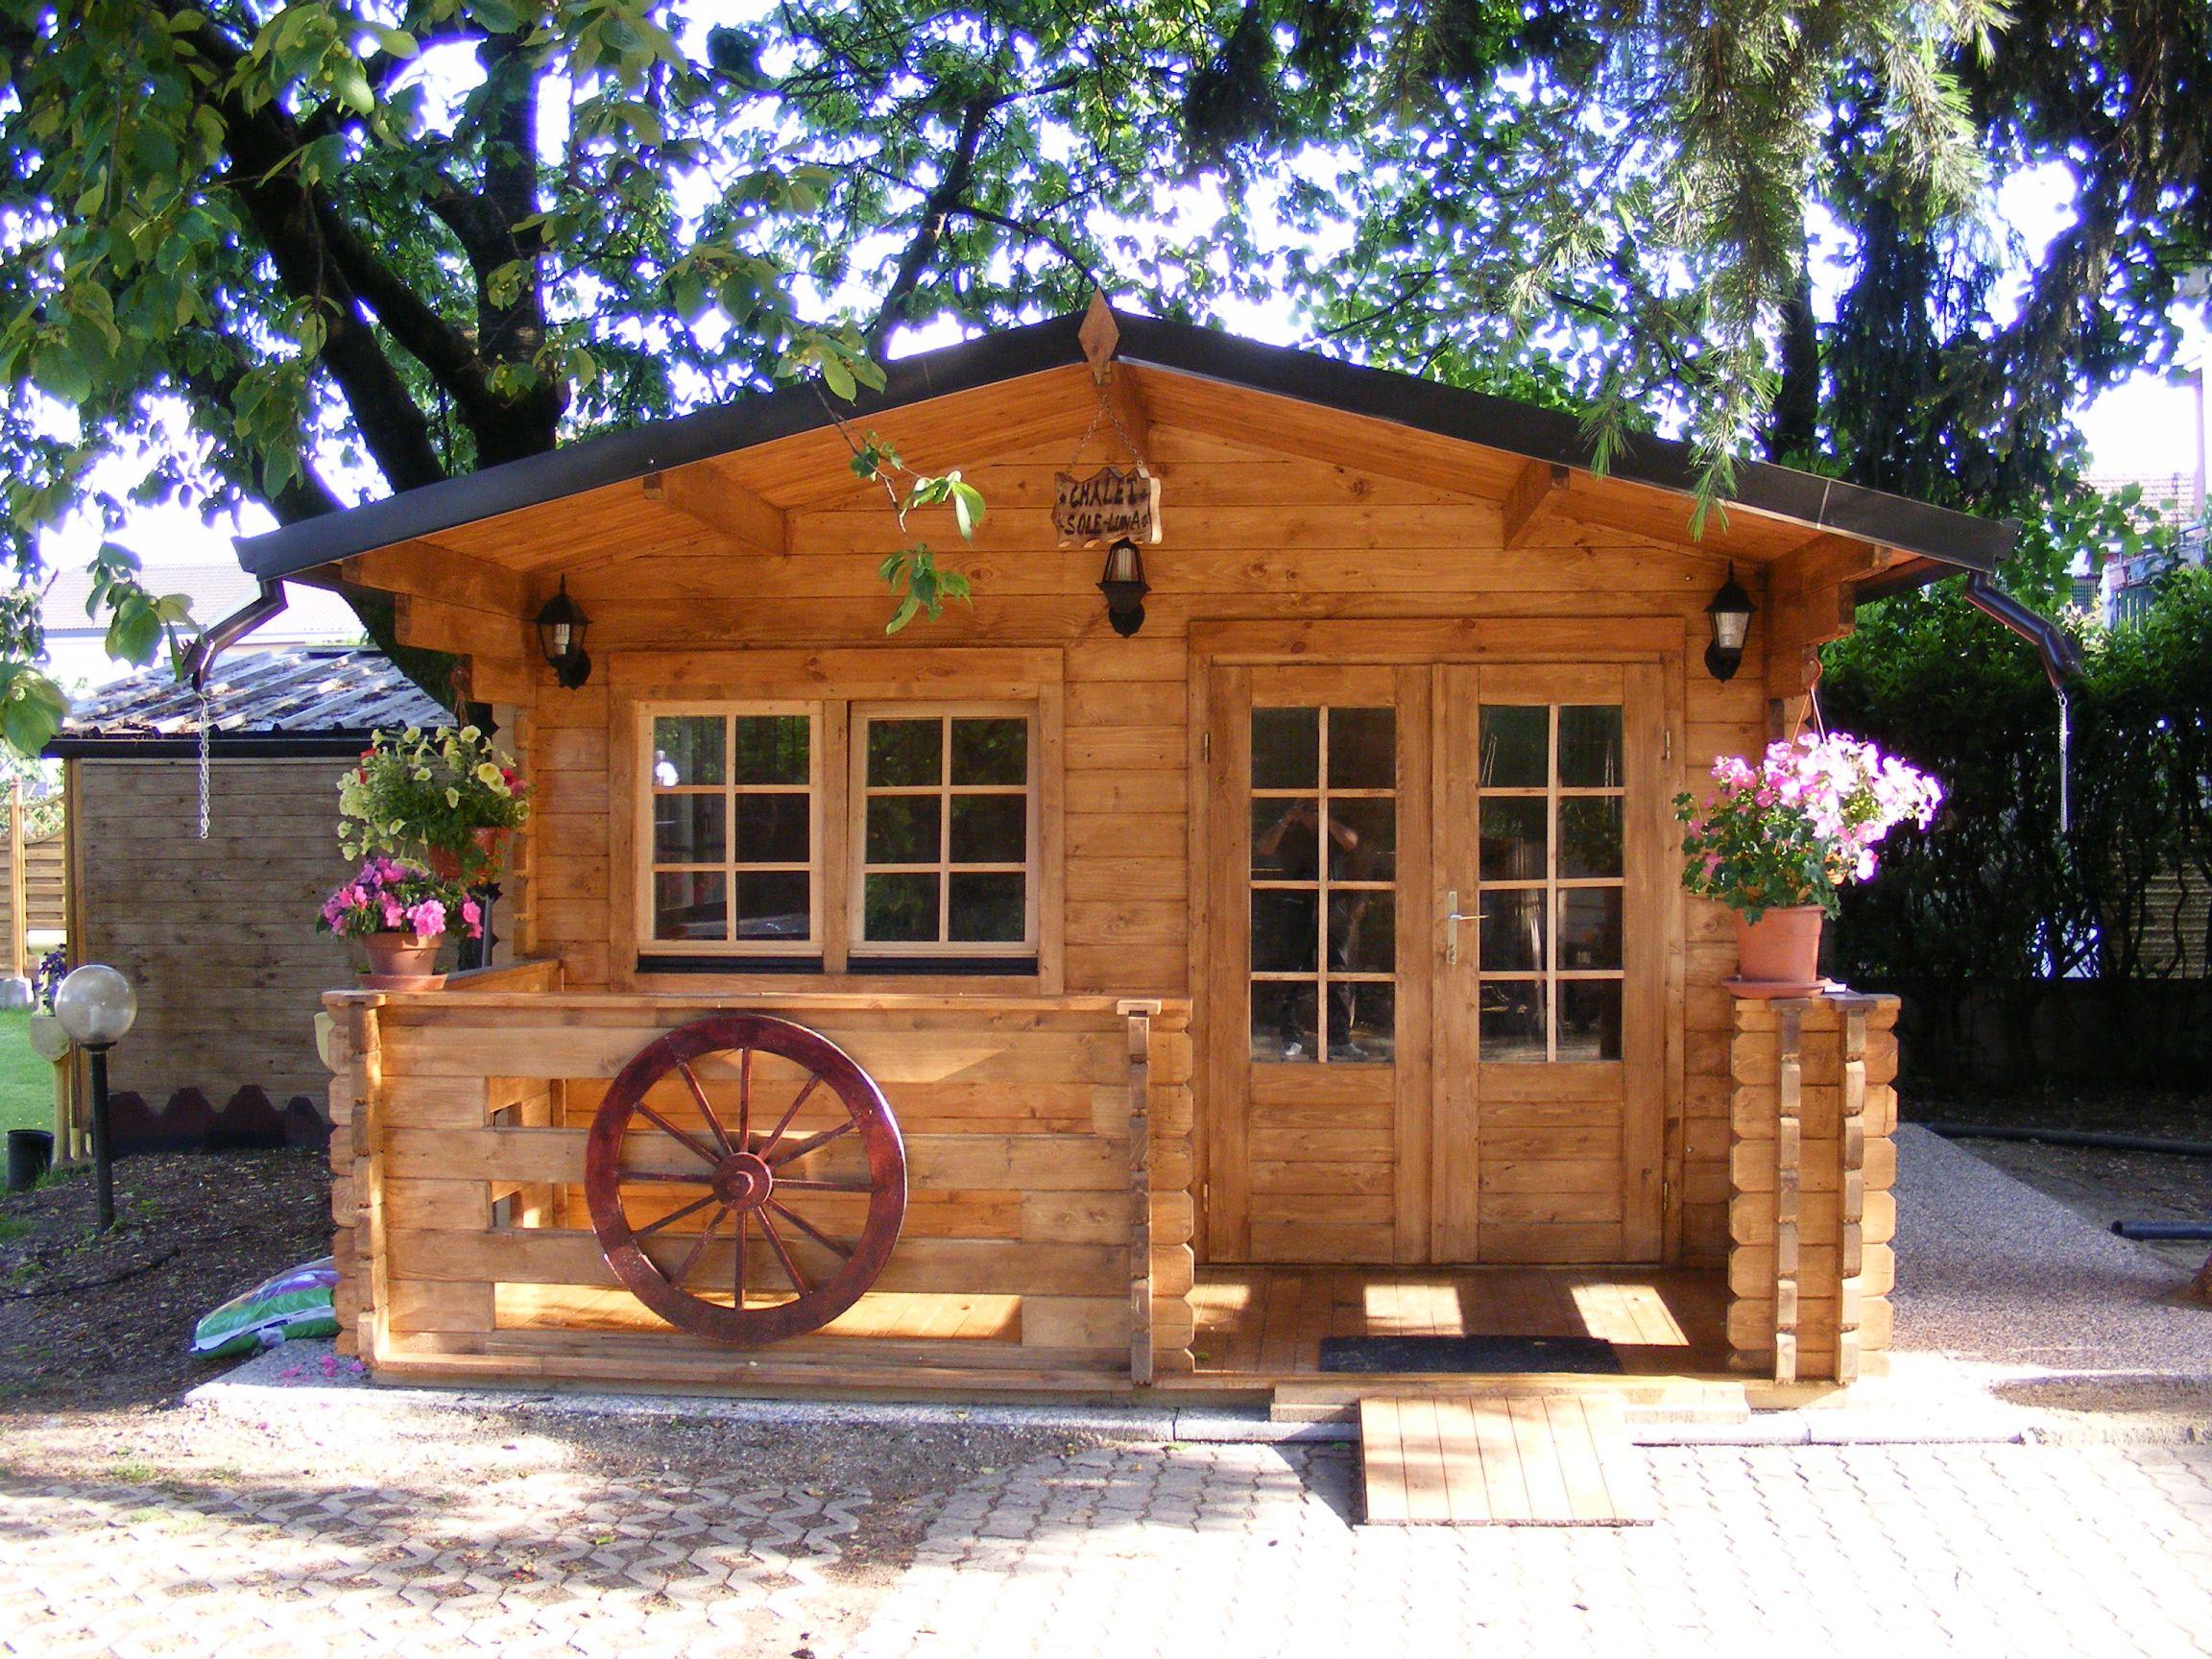 Casetta in legno mod milano 4x4 for Immagini di case arredate